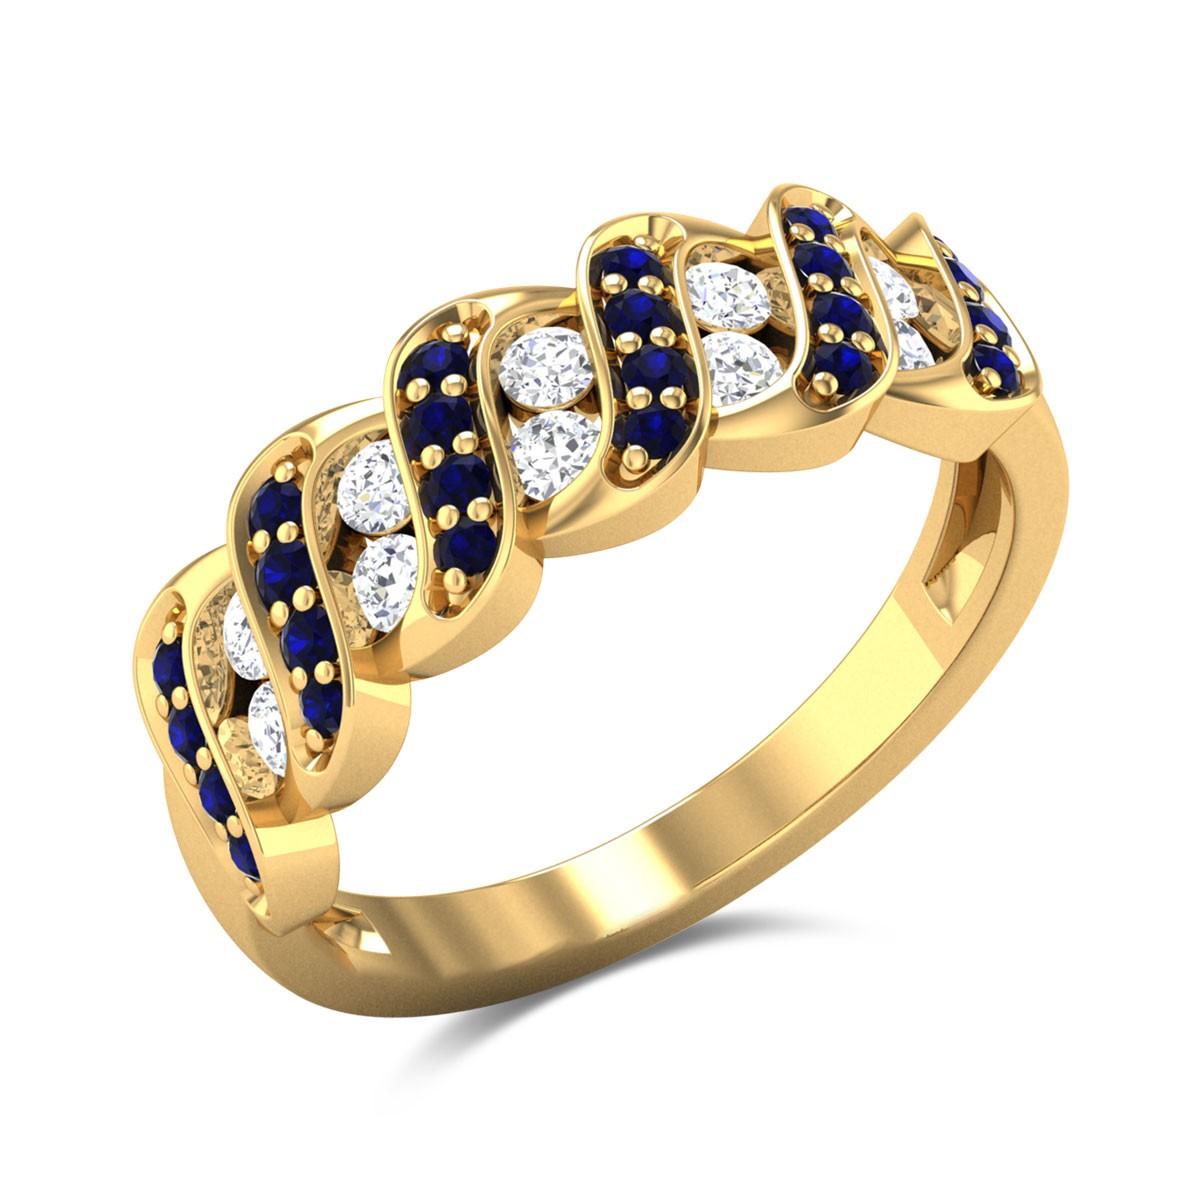 Bahjat Wavy Diamond and Sapphire Ring